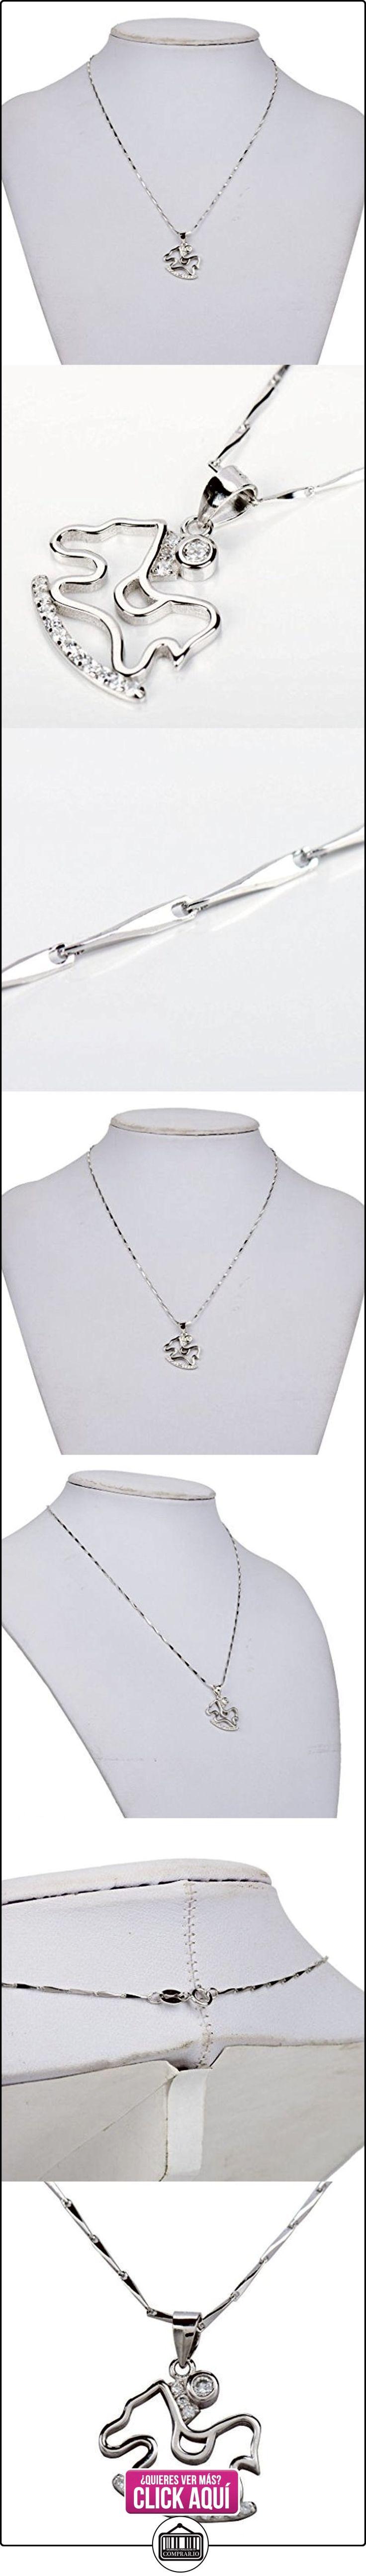 Lackingone Colgante collar de PLATA PURA para mujer para chica de 45cm Diseño Caballo de balancín  ✿ Joyas para mujer - Las mejores ofertas ✿ ▬► Ver oferta: http://comprar.io/goto/B0187EG3PQ